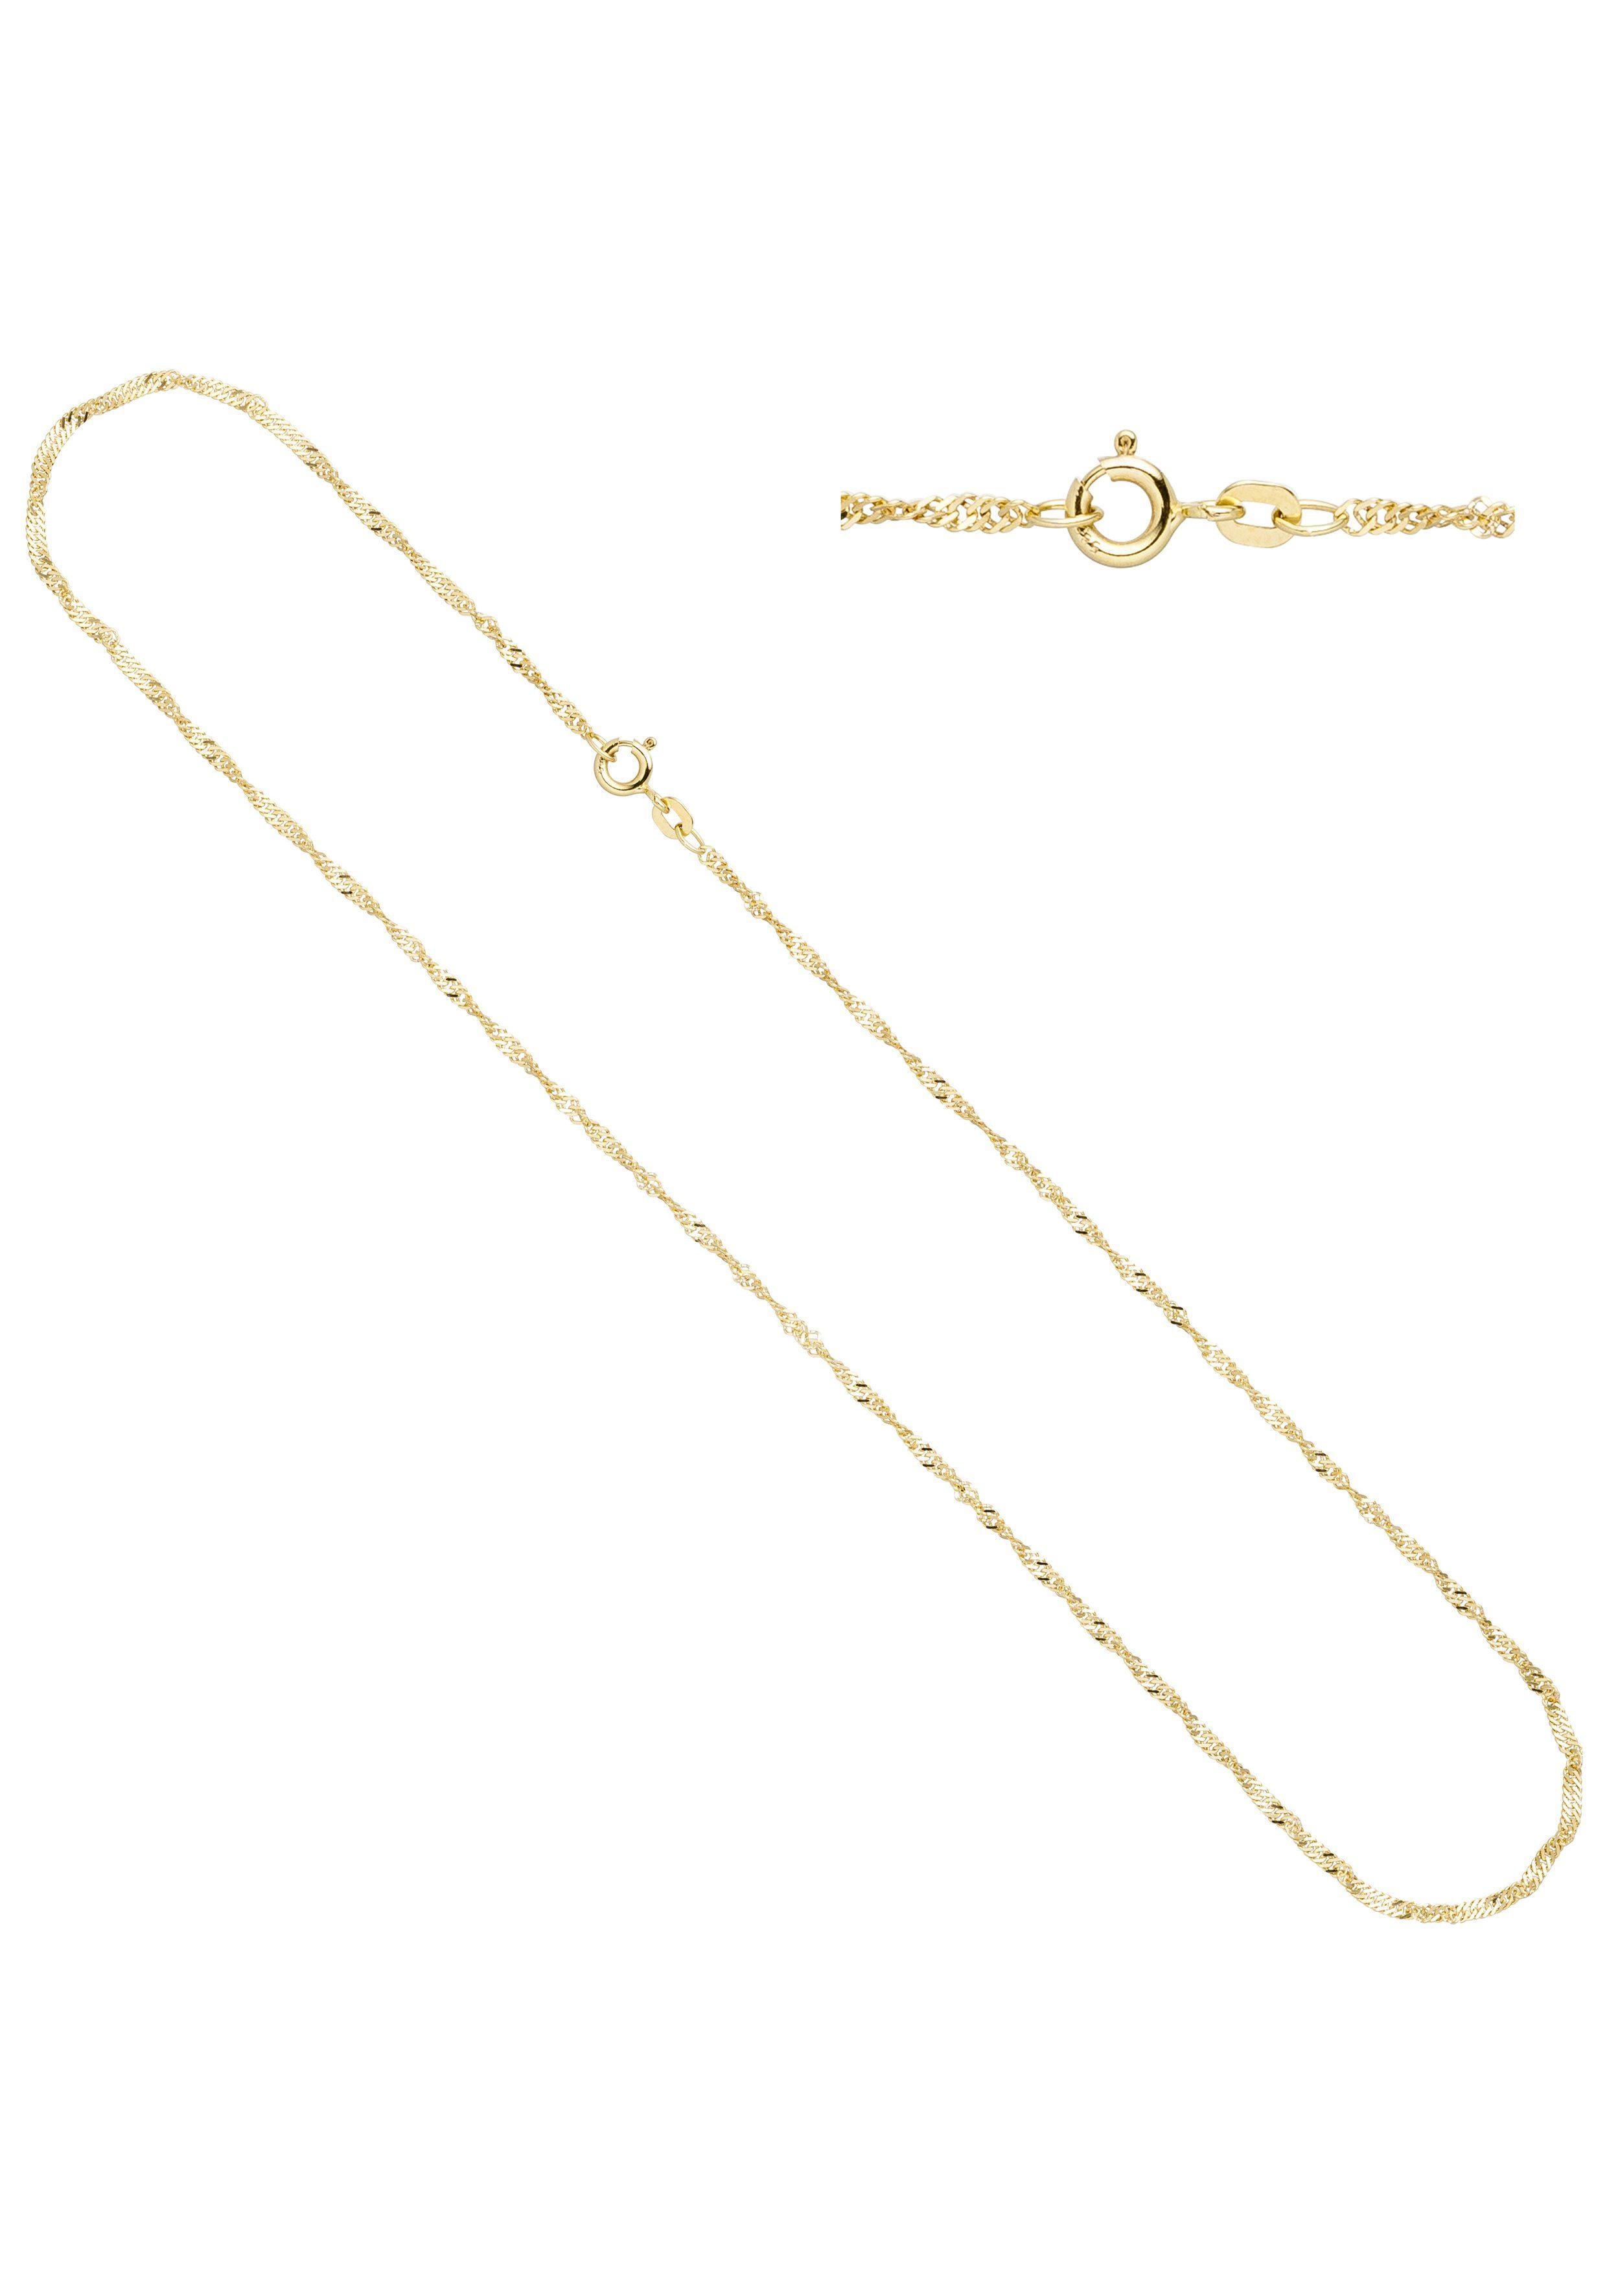 JOBO Goldkette »Singapurkette« Singapurkette 585 Gold 45 cm 1,8 mm